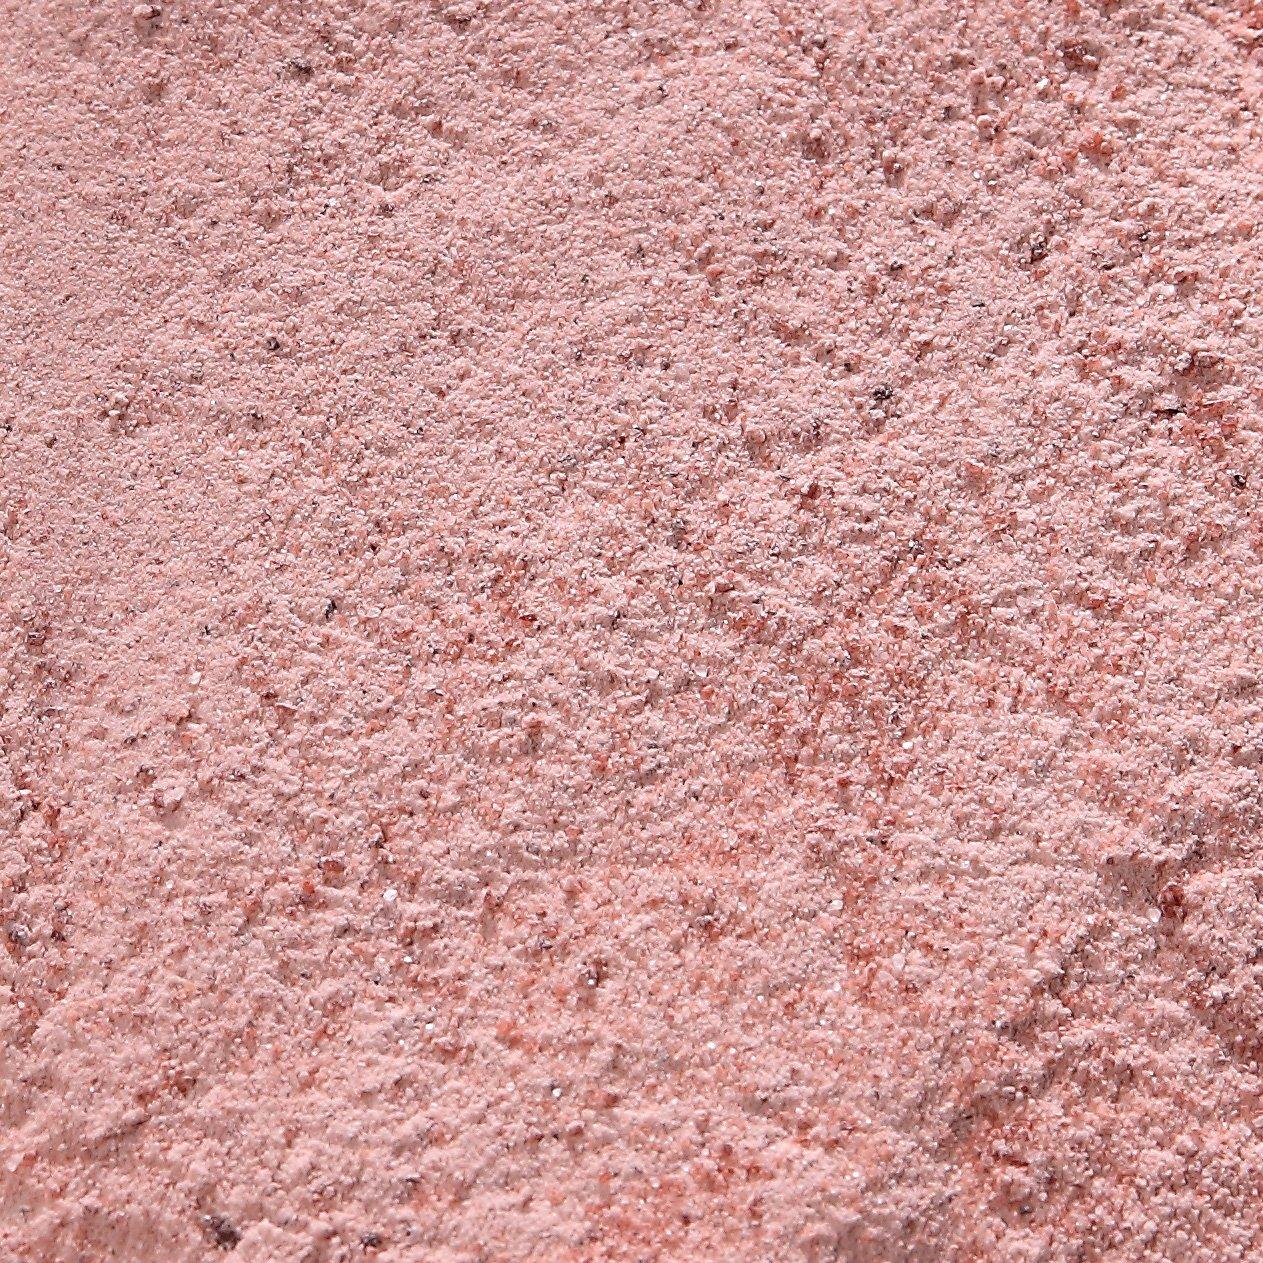 The Spice Lab Himalayan Black Crystal Salt - Kala Namak Mineral - Fine Ground - 16 Oz